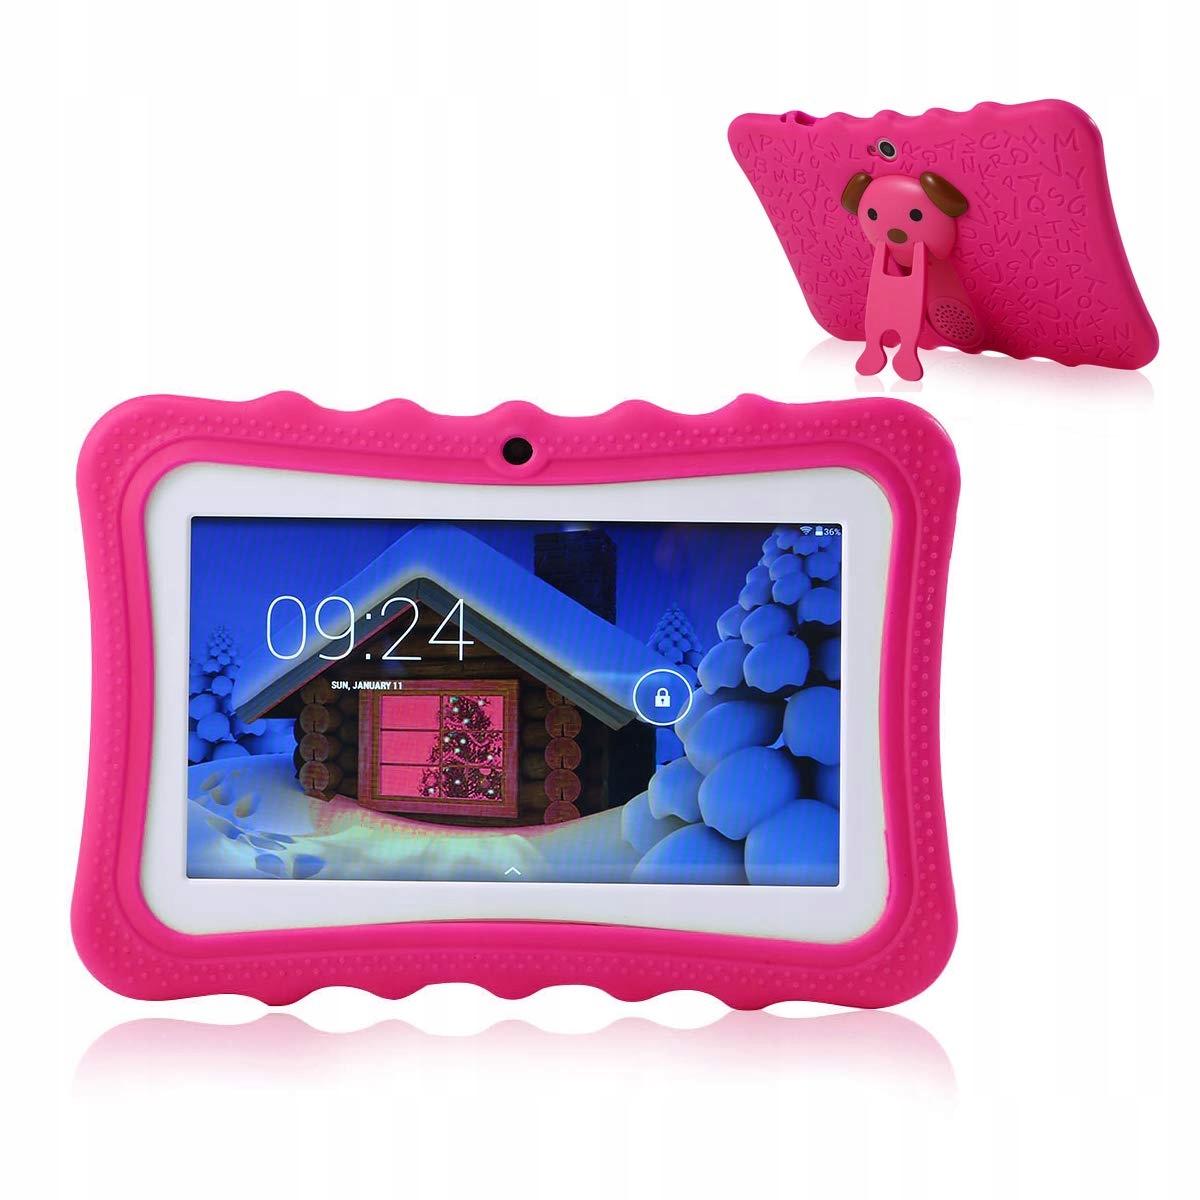 Detský dotykový tablet, 7 palcový WiFi tablet,